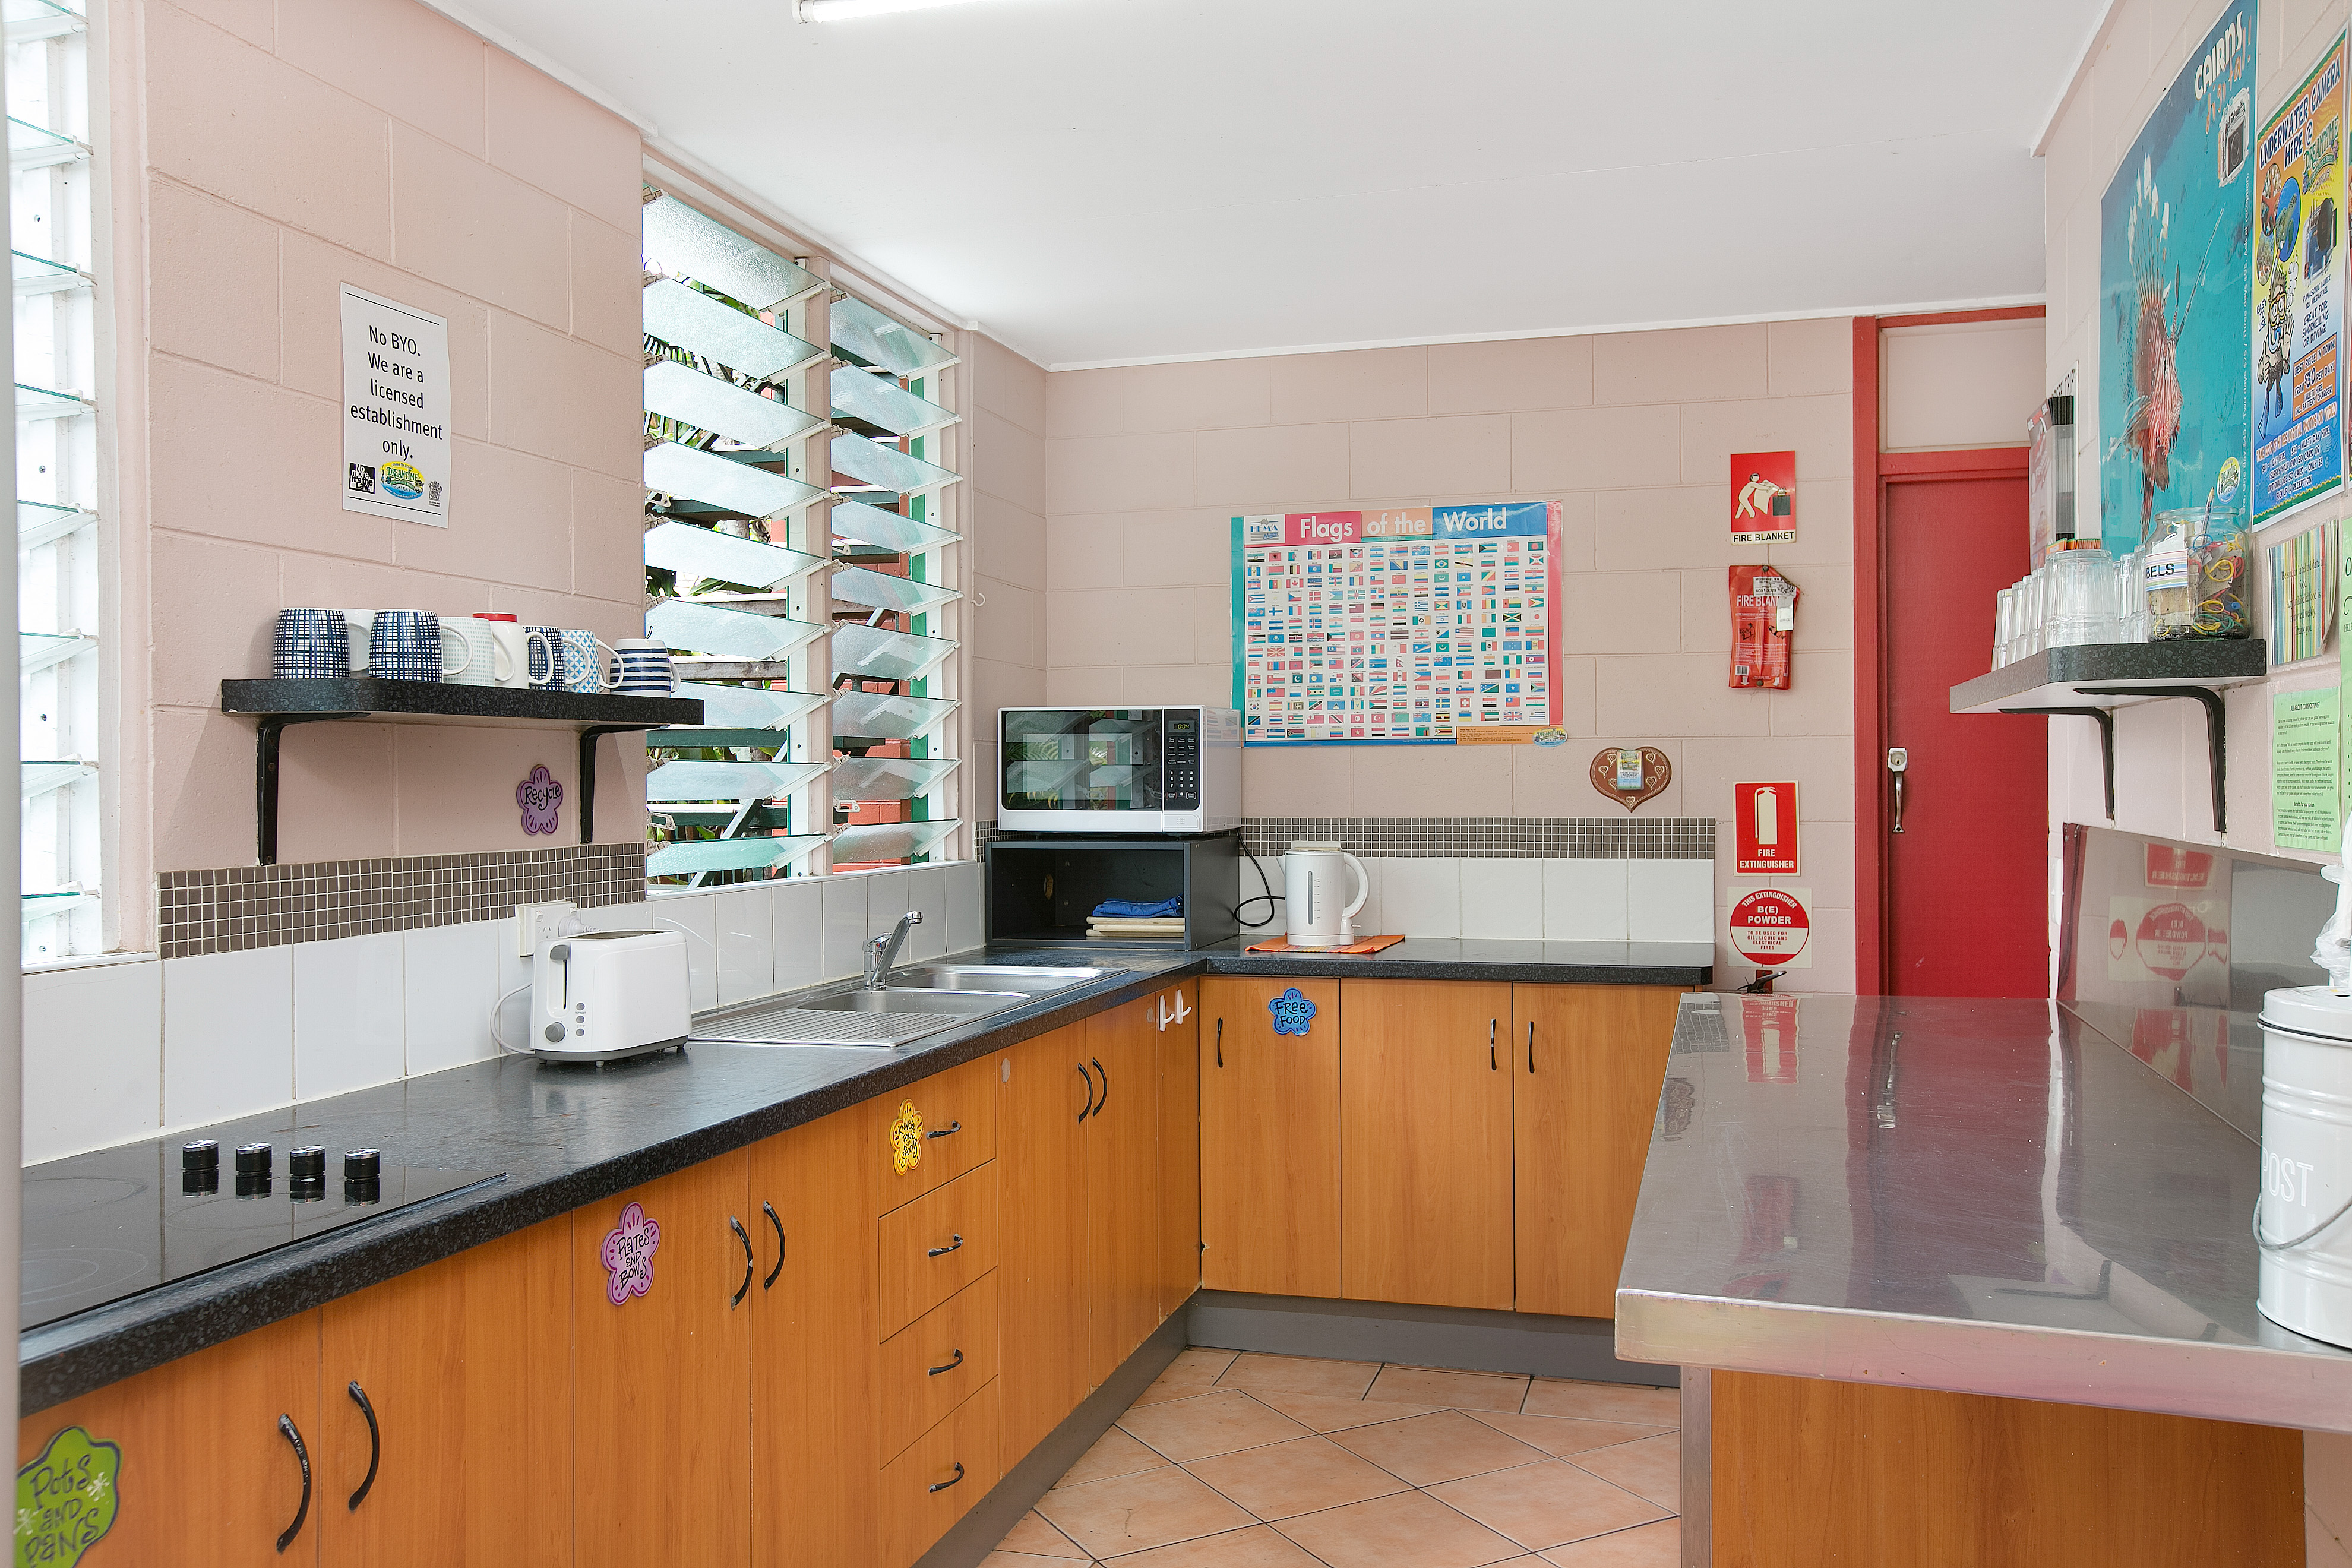 Dreamtime Hostel Cairns kitchen